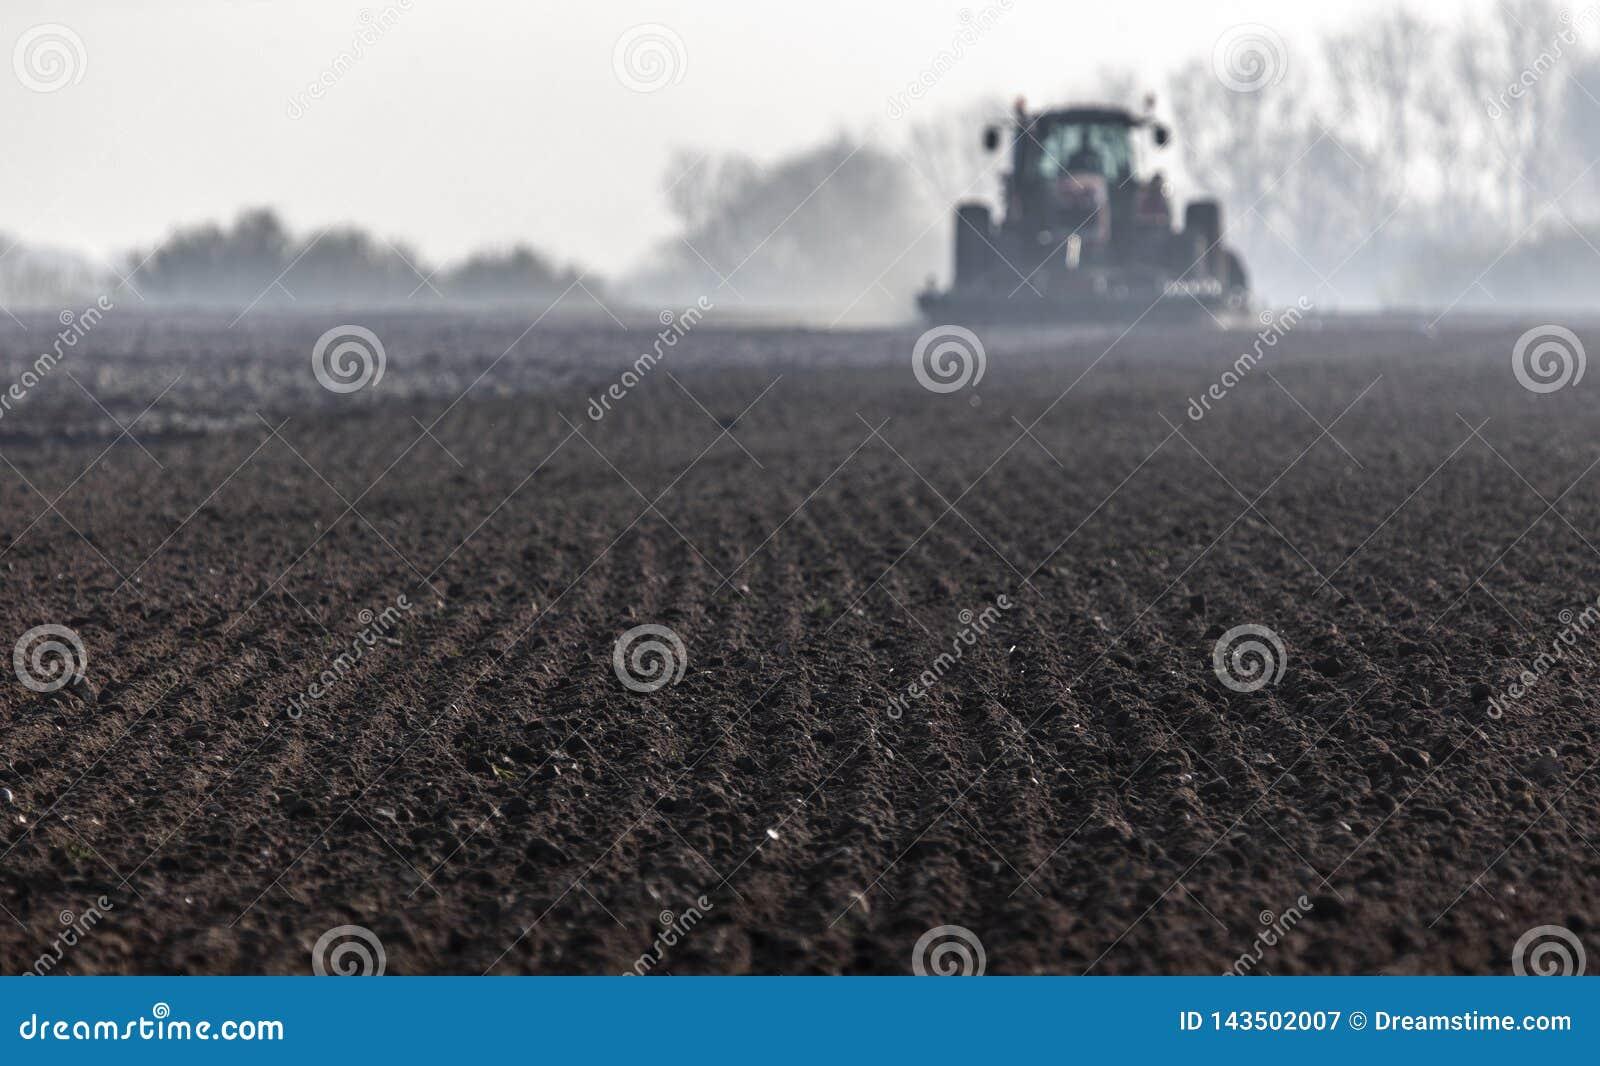 Prepared soil for spring planting